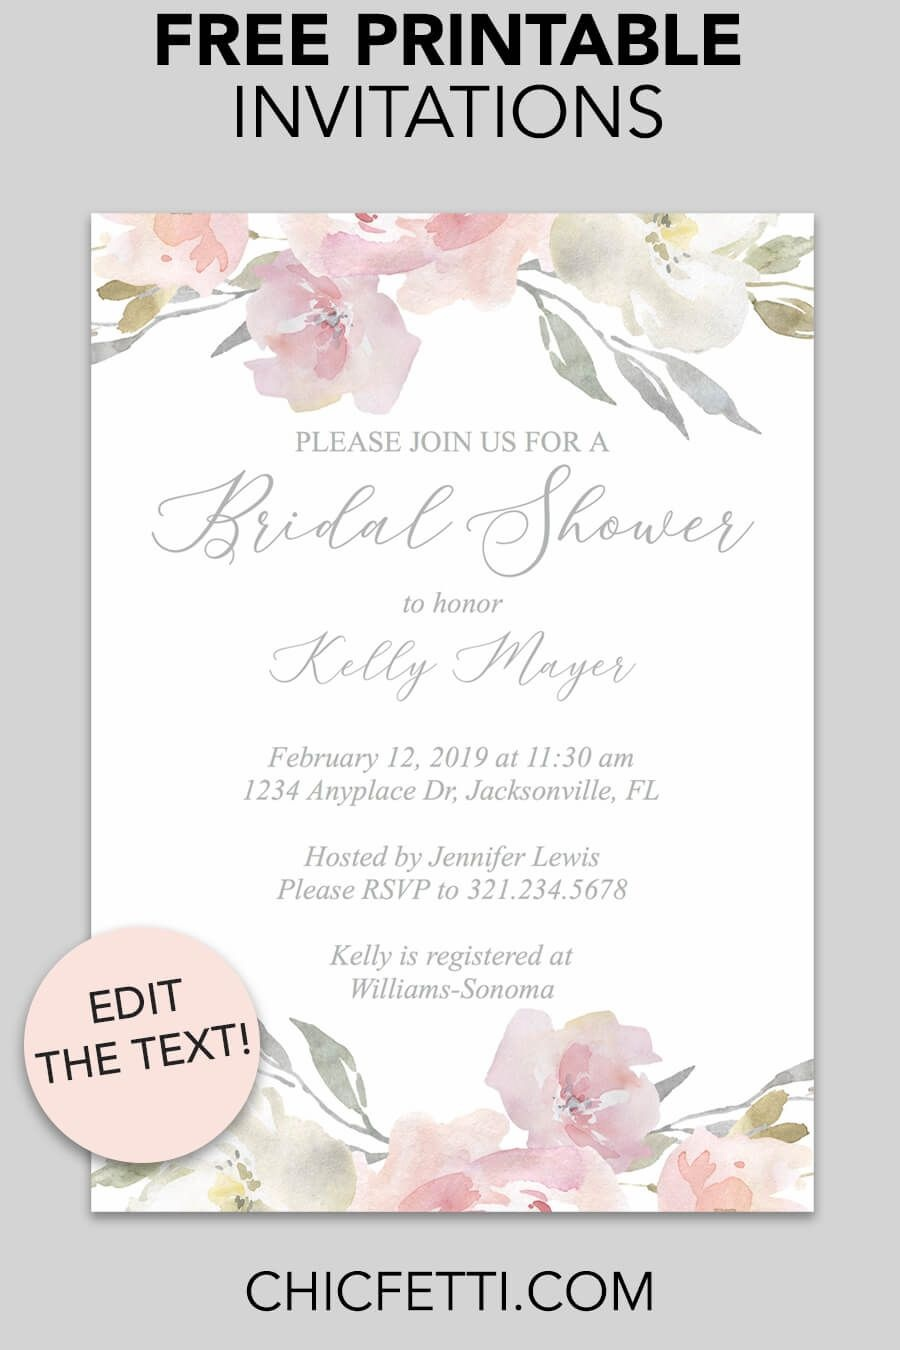 Bridal Shower Printable Invitation (Blush Floral | Invitations - Free Printable Bridal Shower Invitations